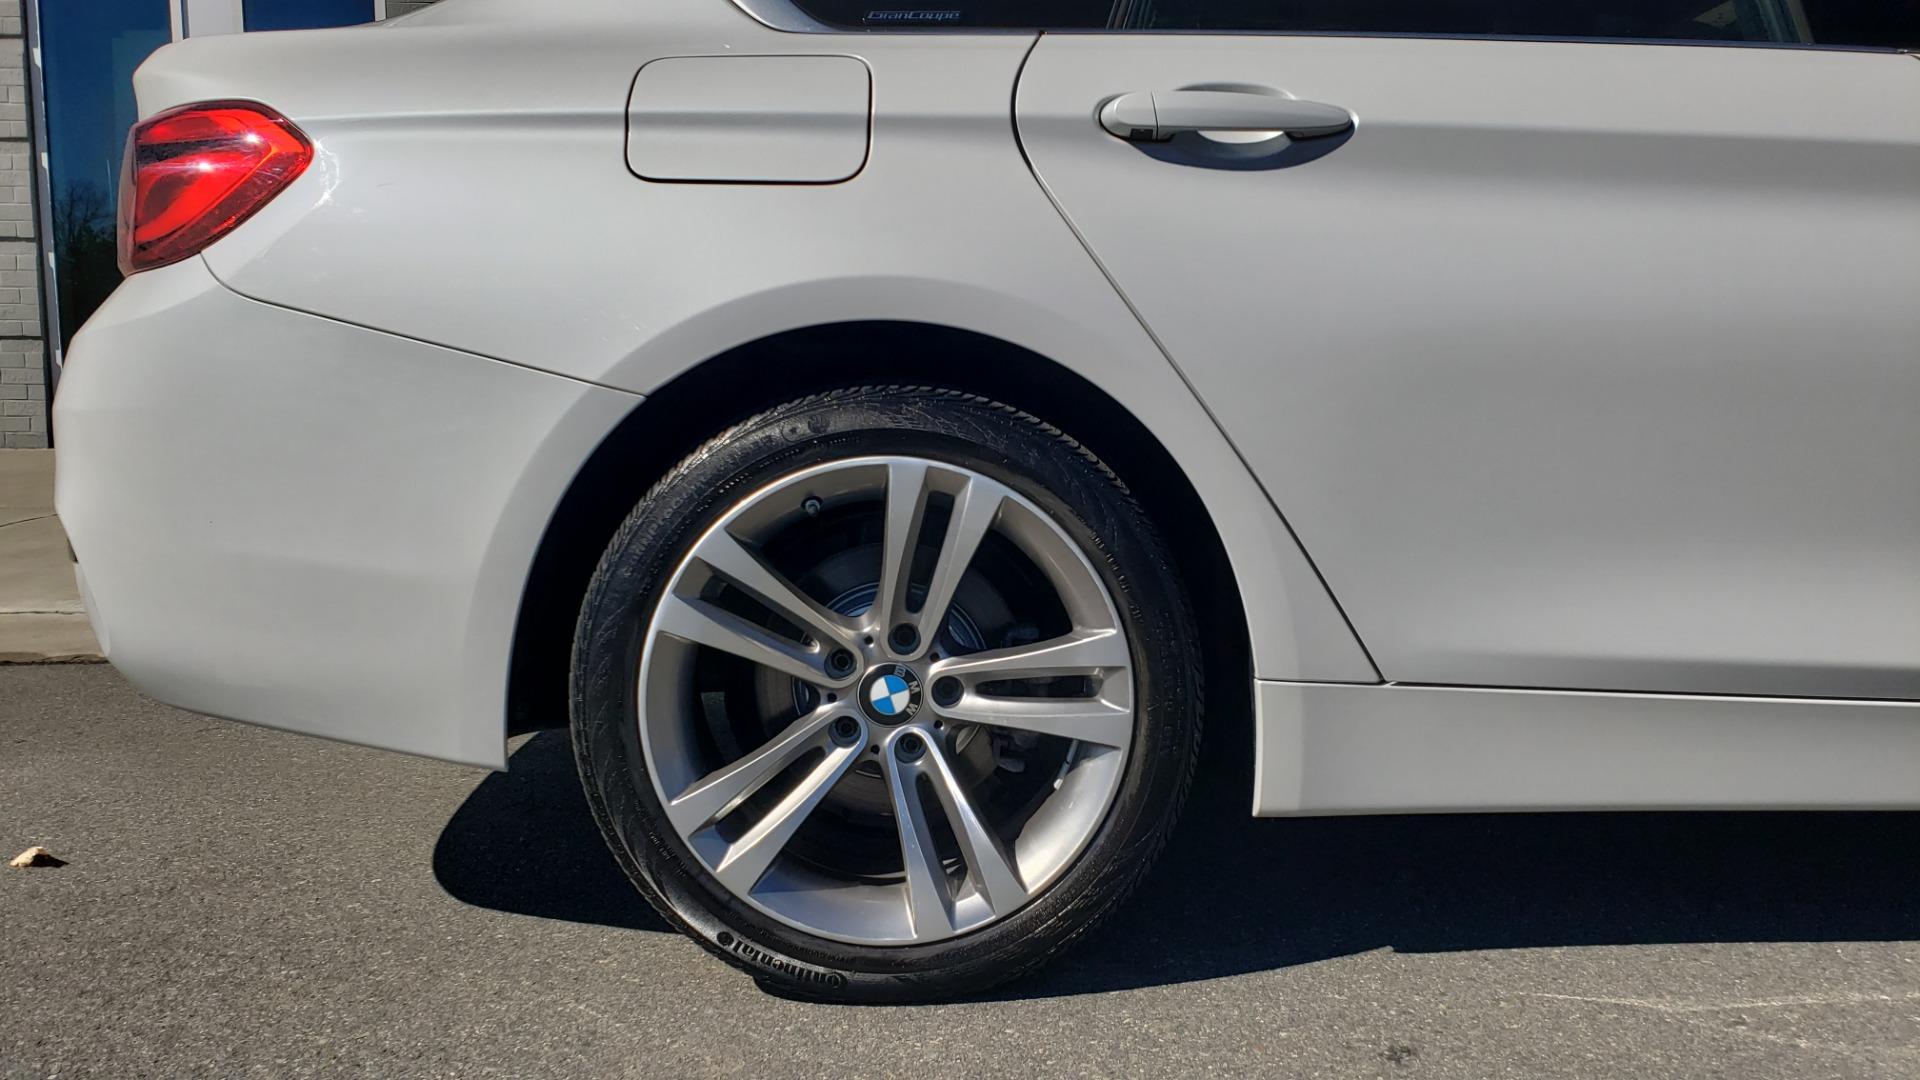 Used 2018 BMW 4 SERIES 430IXDRIVE / PREMIUM / NAV / SUNROOF / ESSENTIALS PKG for sale $28,995 at Formula Imports in Charlotte NC 28227 84